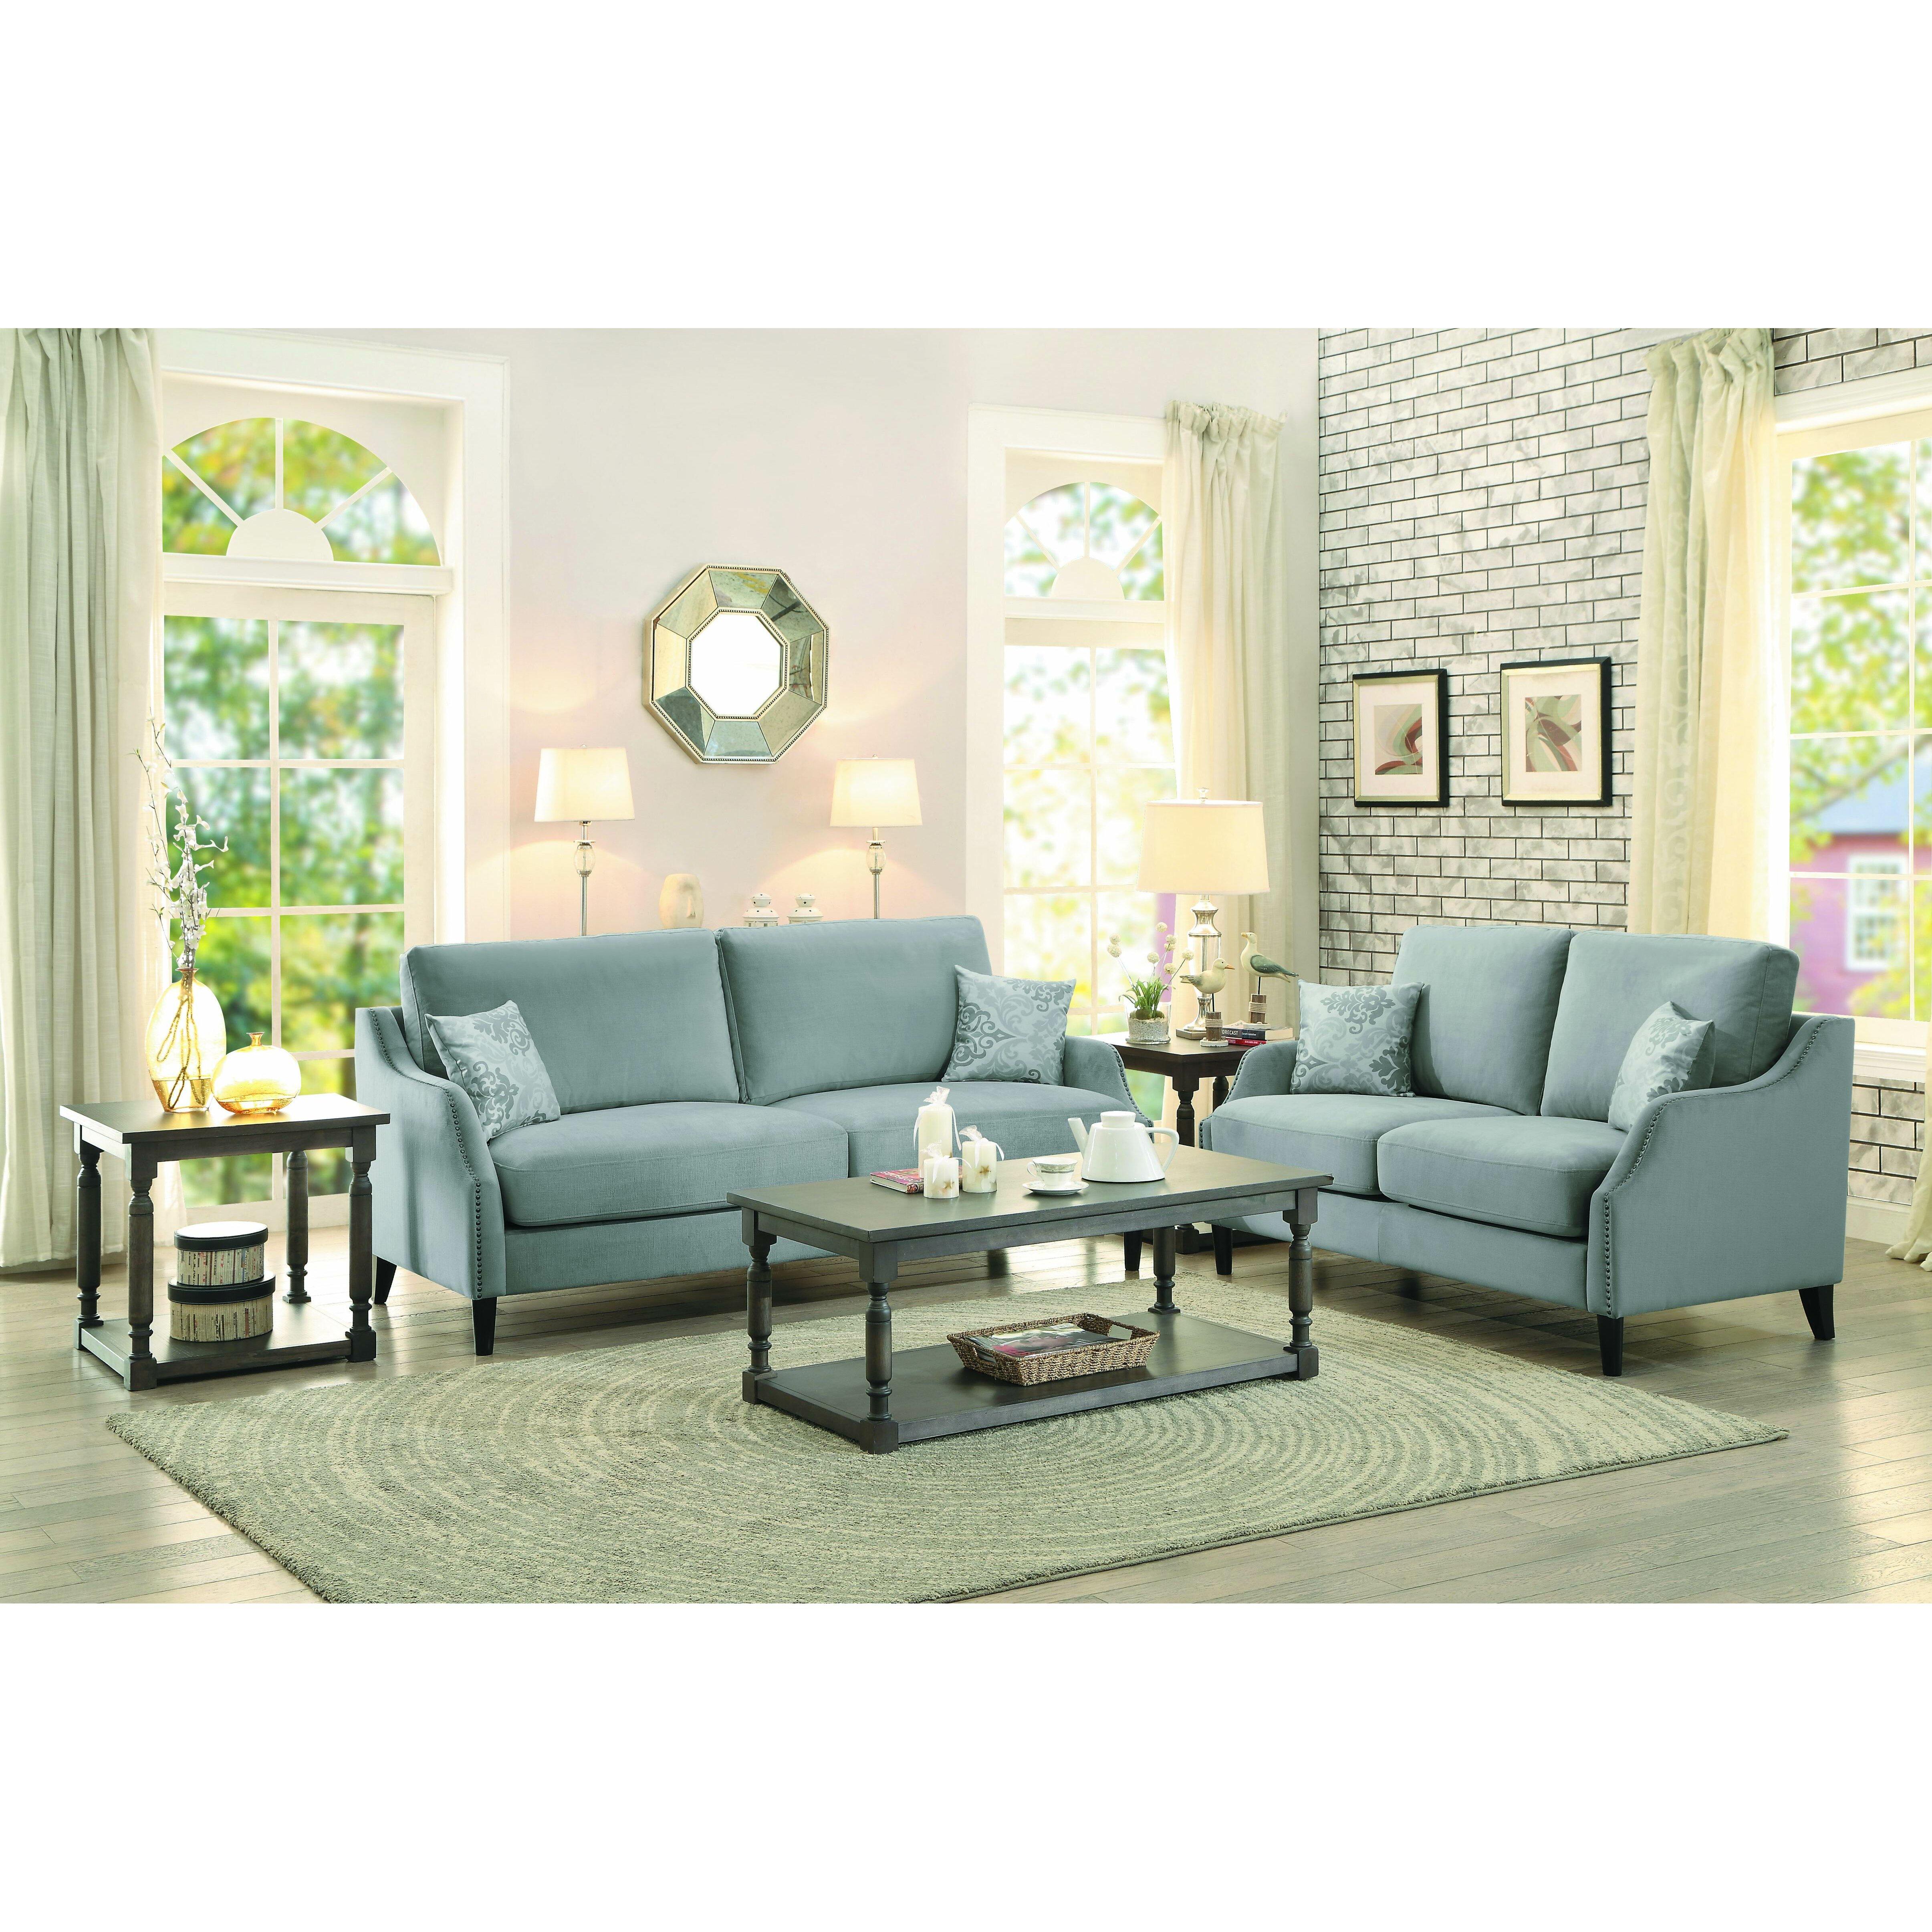 Homelegance Banburry Living Room Collection Wayfair